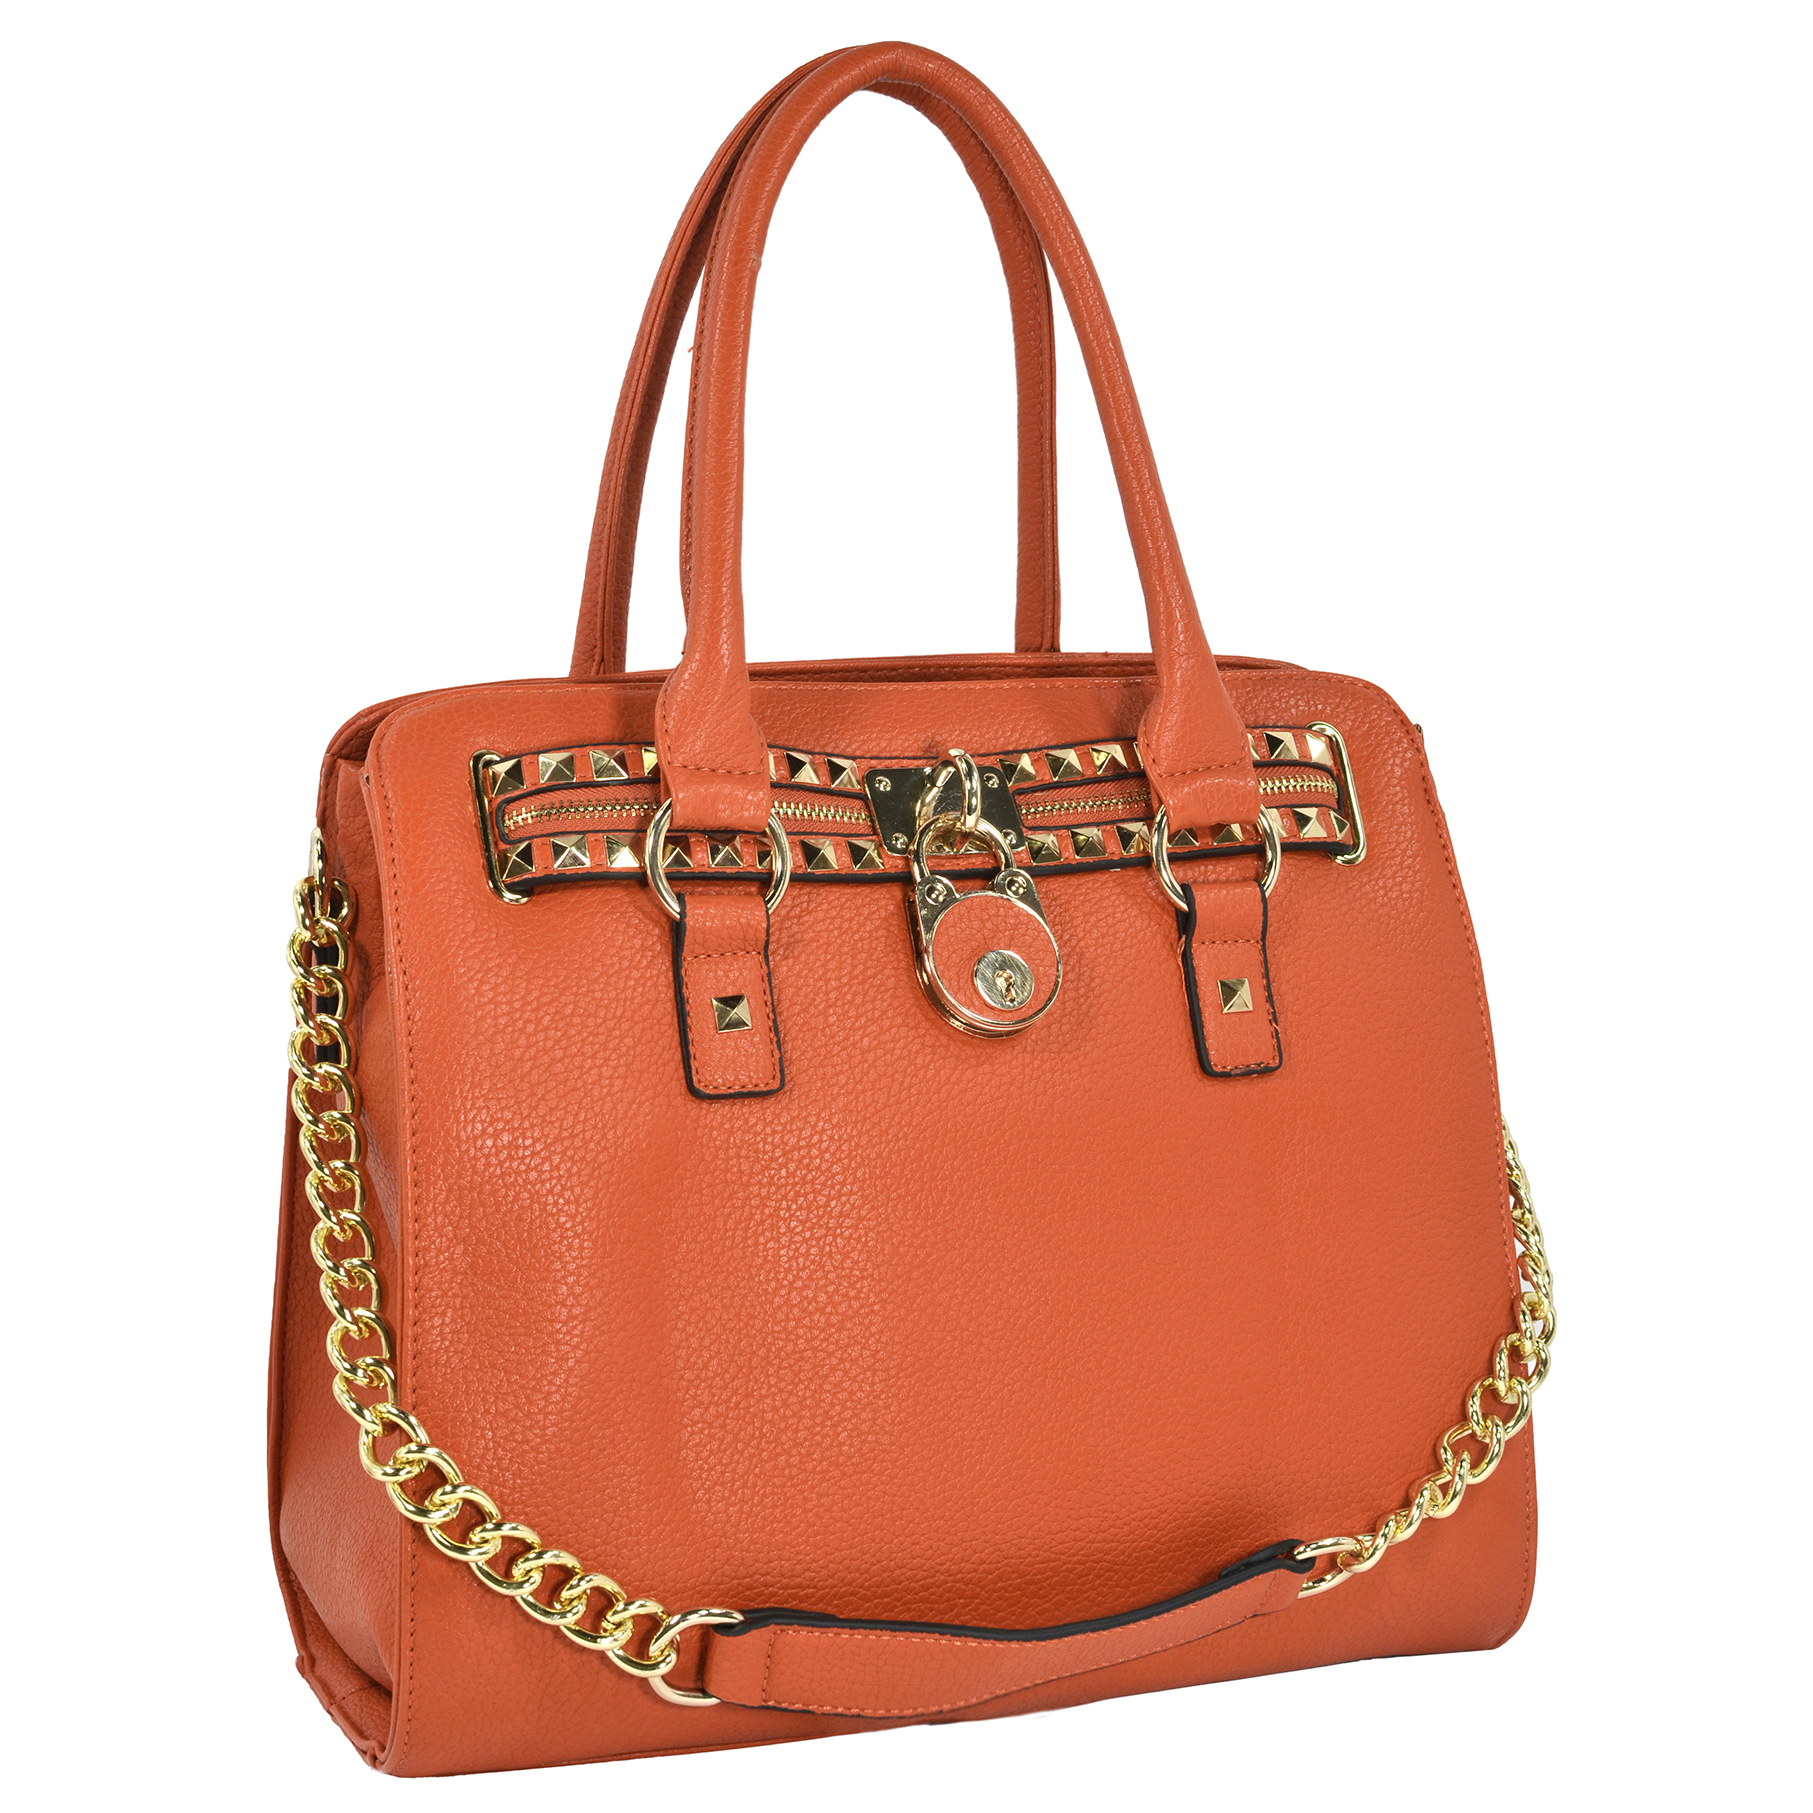 HALEY Orange Bowler Style Handbag main